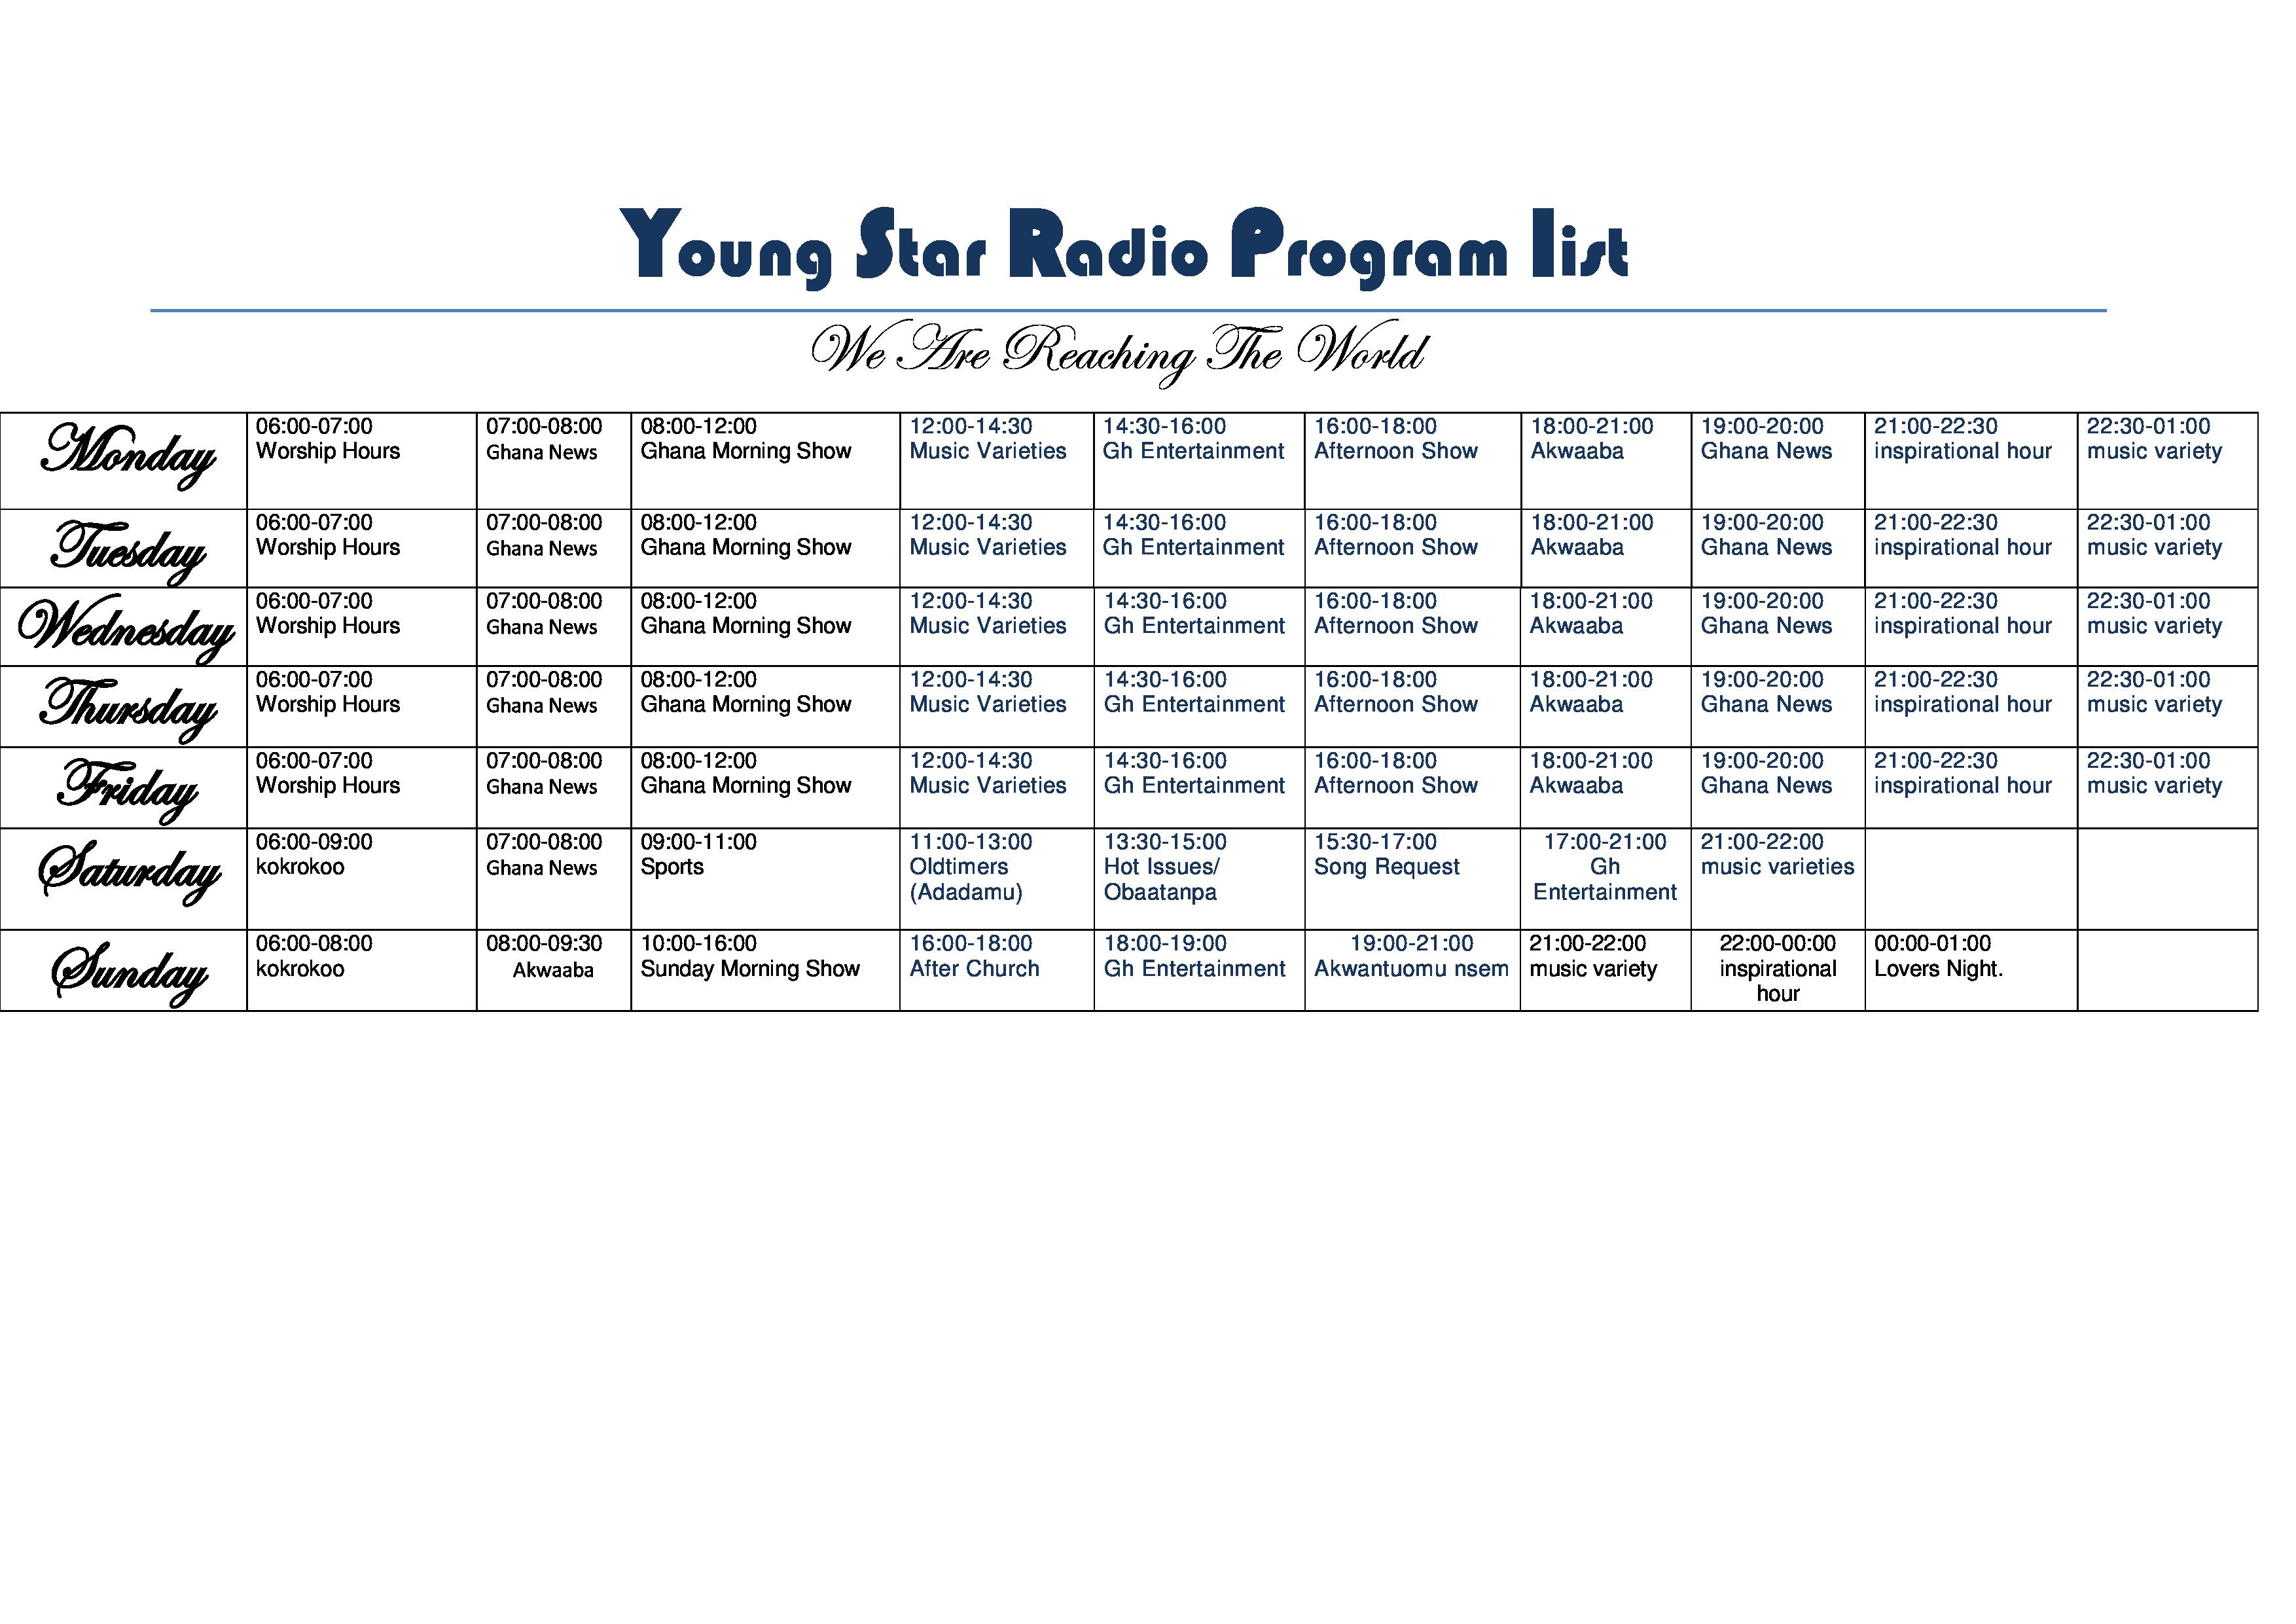 Young Star Radio Program list